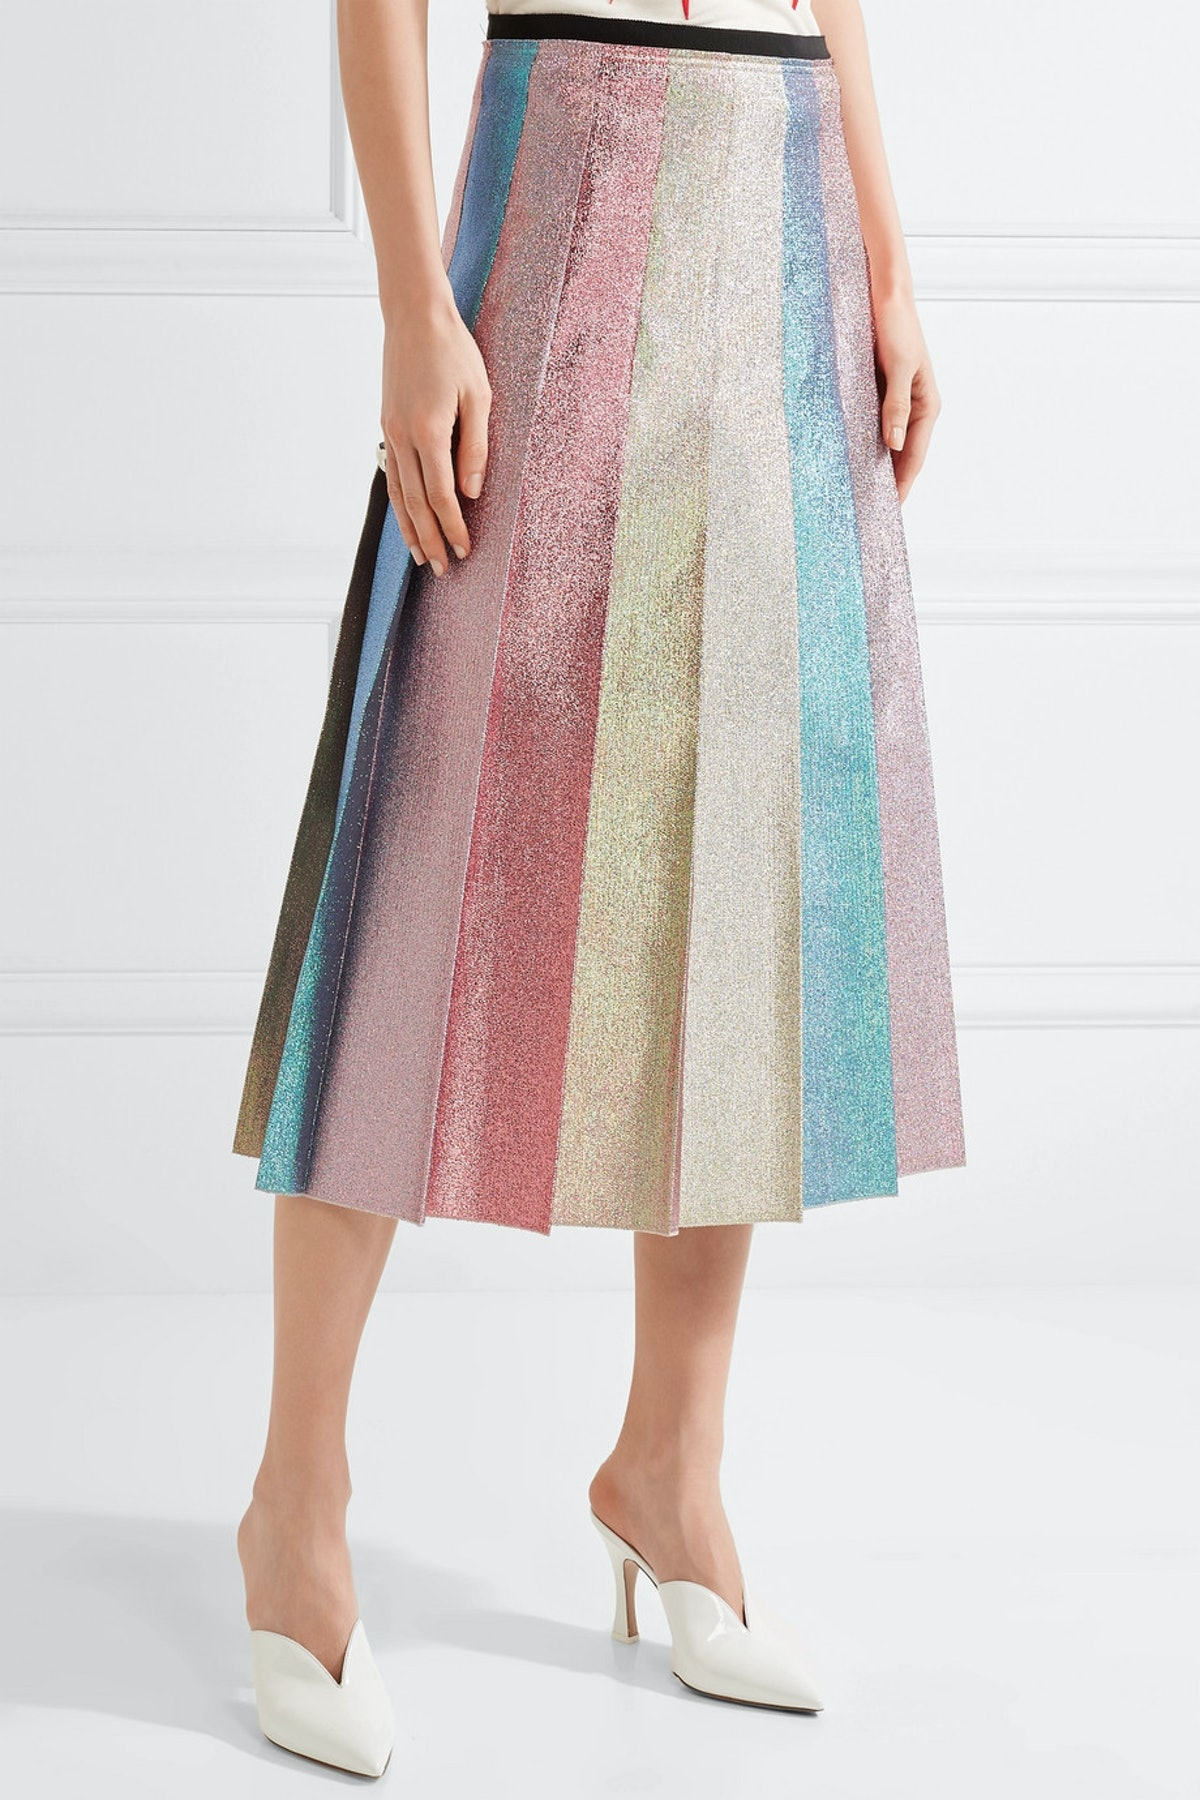 Pleated Lamé Midi Skirt, $1,600, Gucci